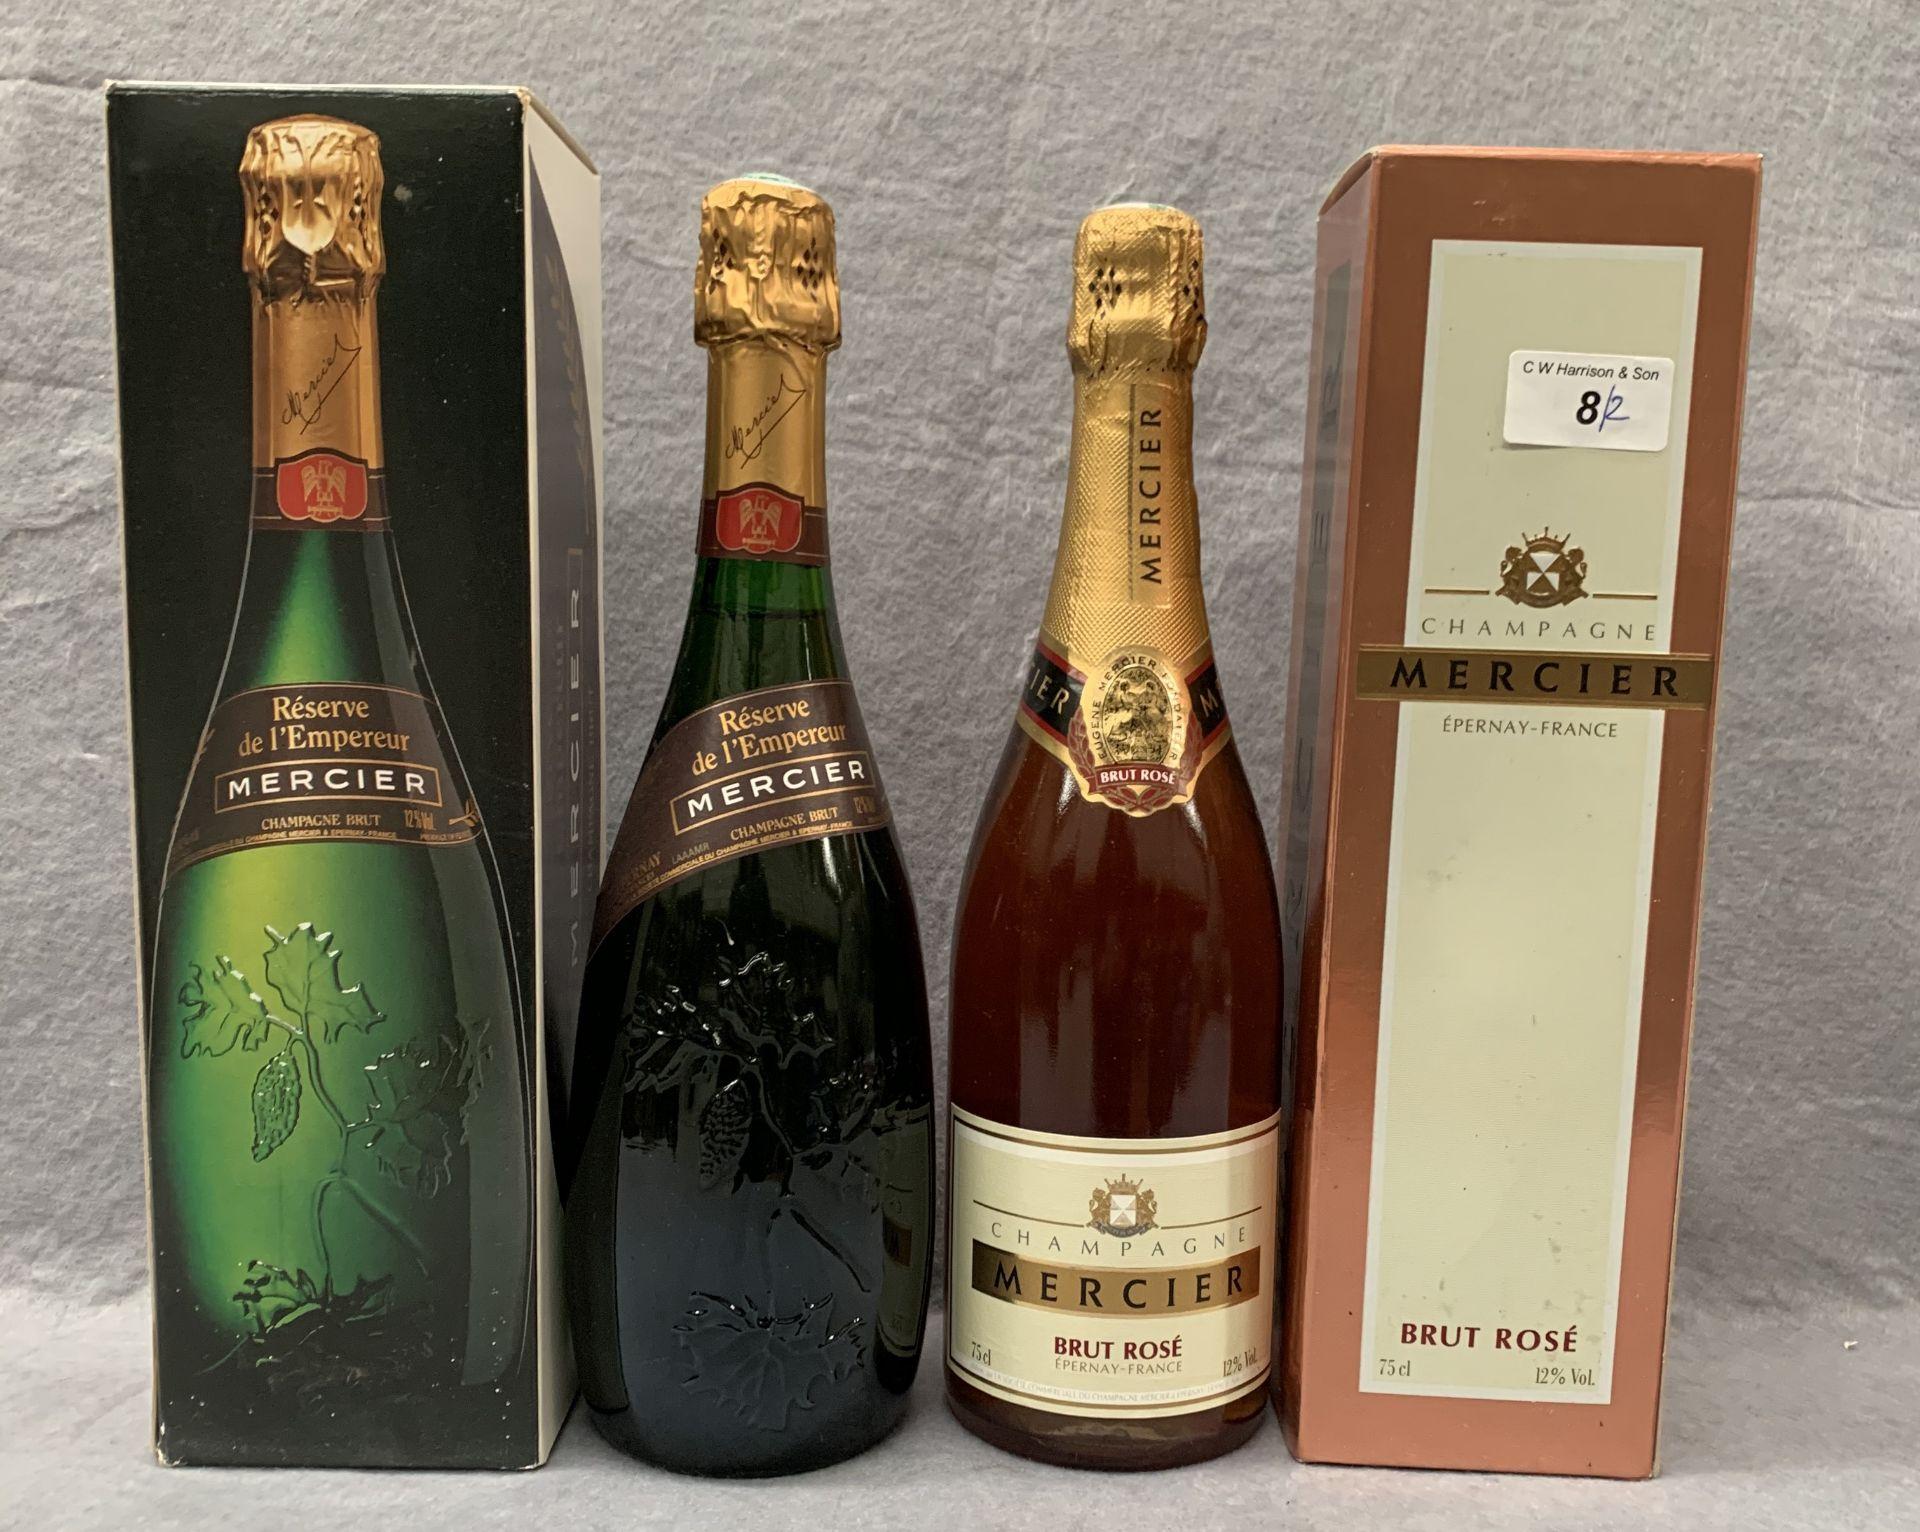 Lot 8 - A 75cl bottle of Mercier Reserve de l'Empereur Champagne Brut in presentation box and a 75cl bottle